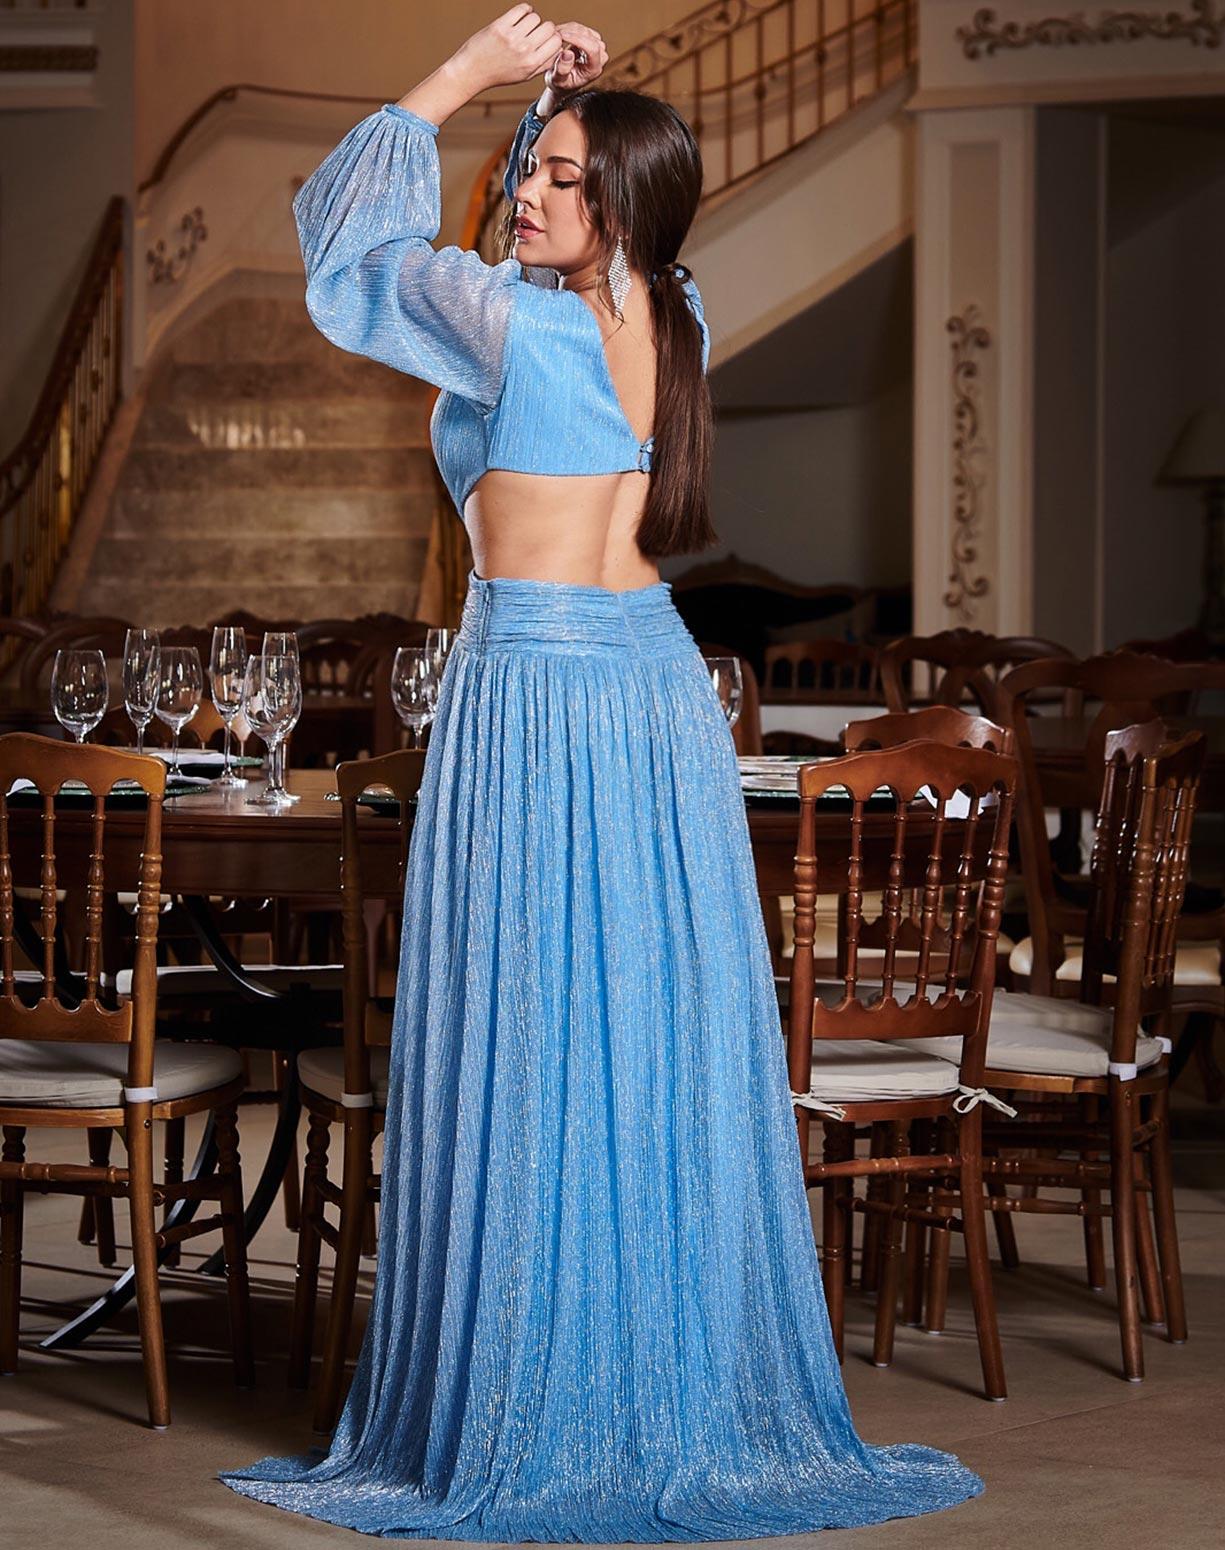 Vestido Azul Serenity em Tule de Lurex